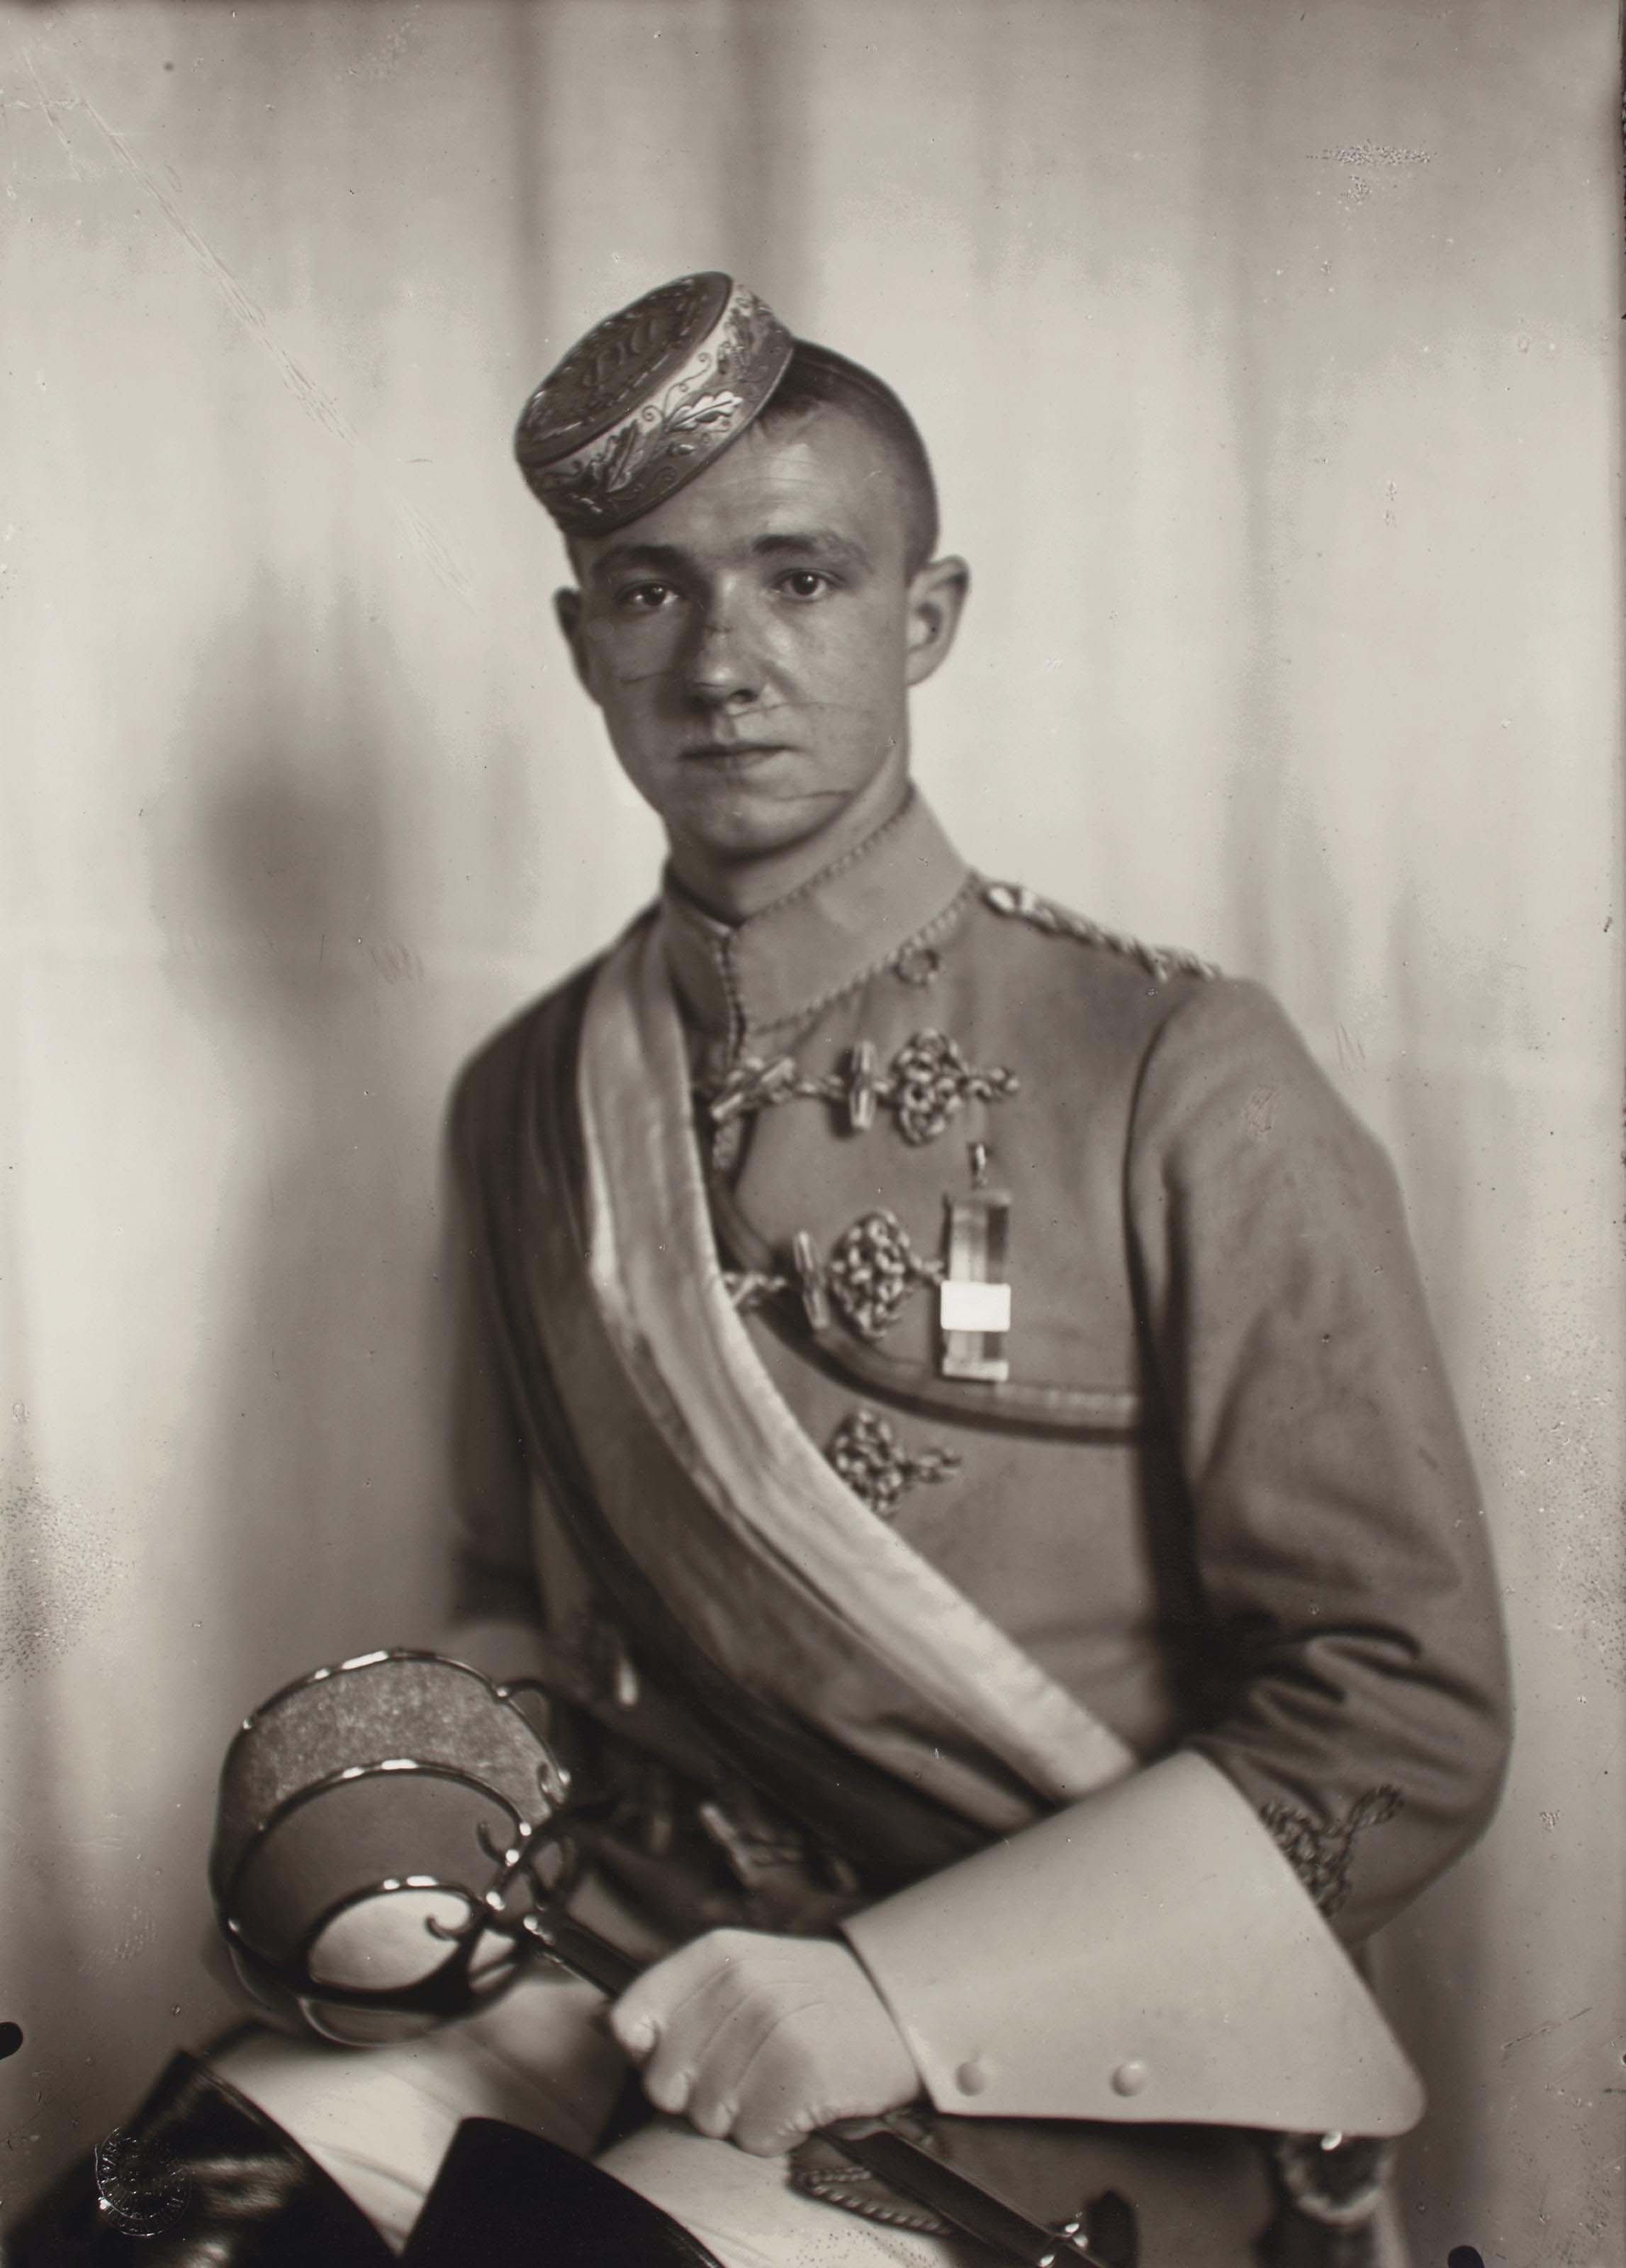 Korps Student from Nuremberg, 1928